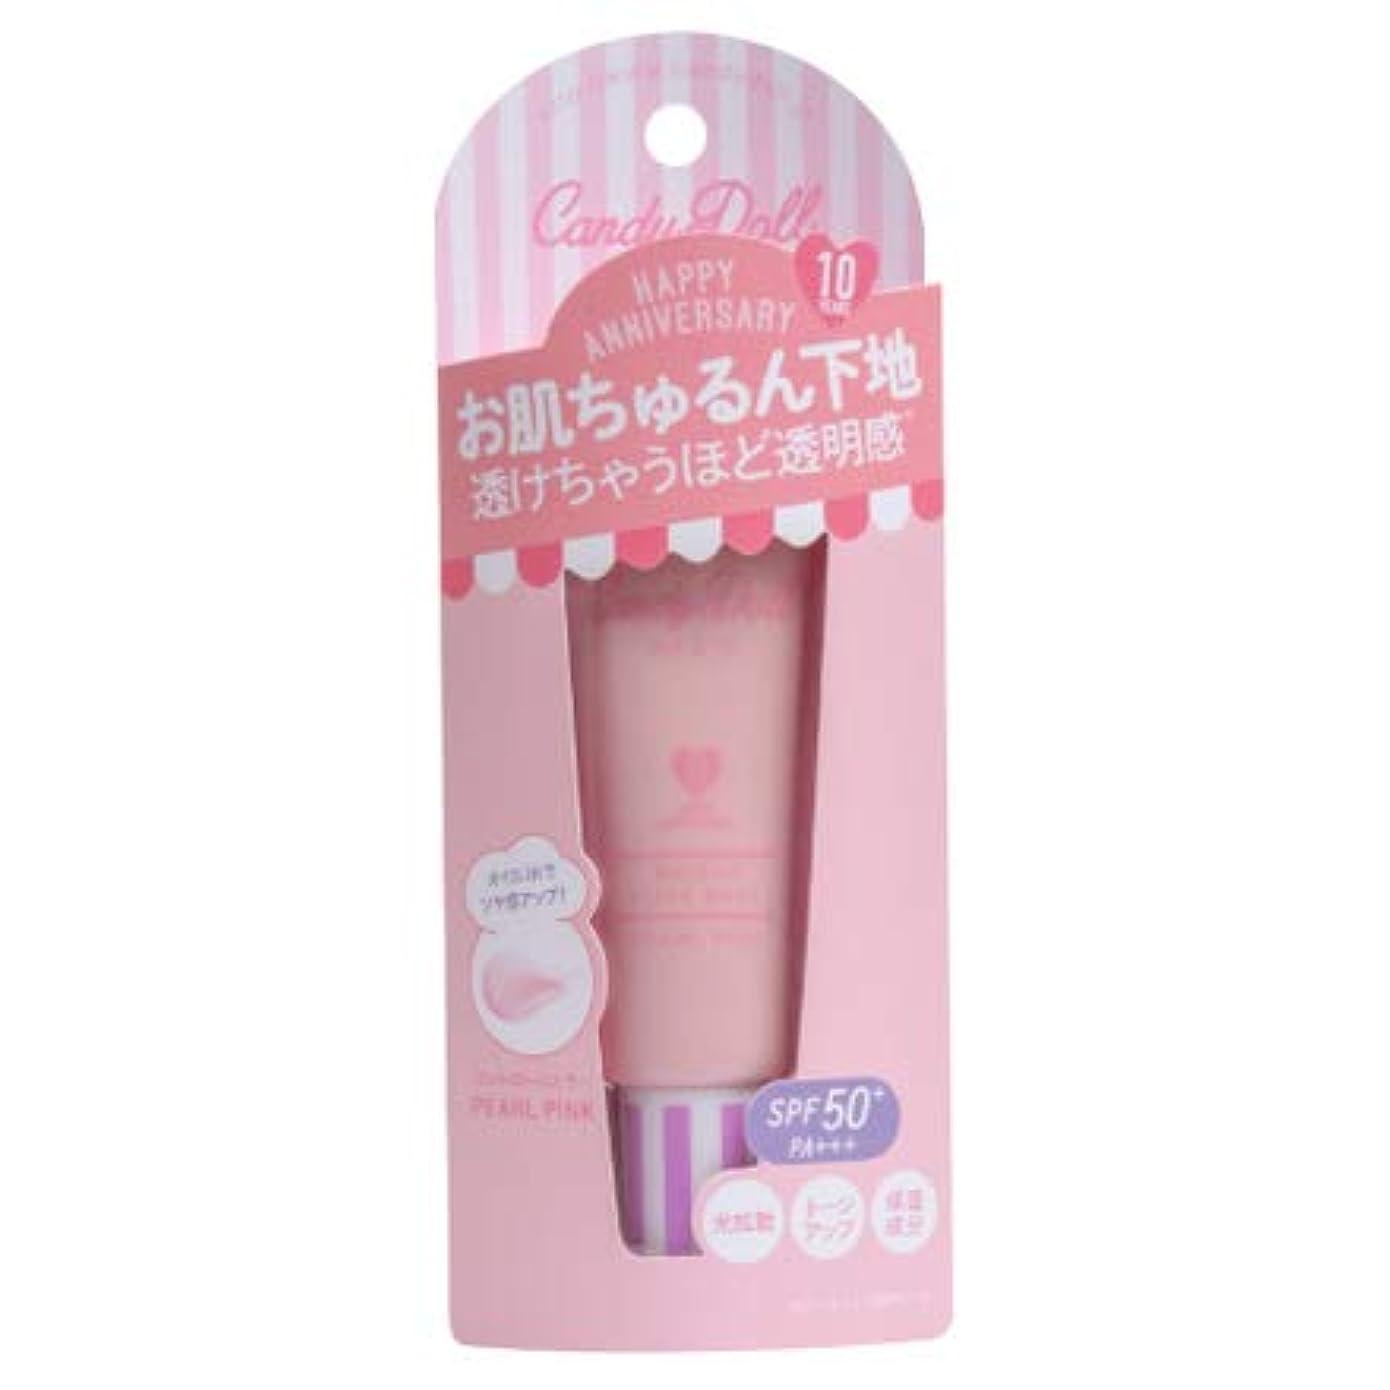 CandyDoll(キャンディドール) ブライトピュアベース 限定色 パールピンク